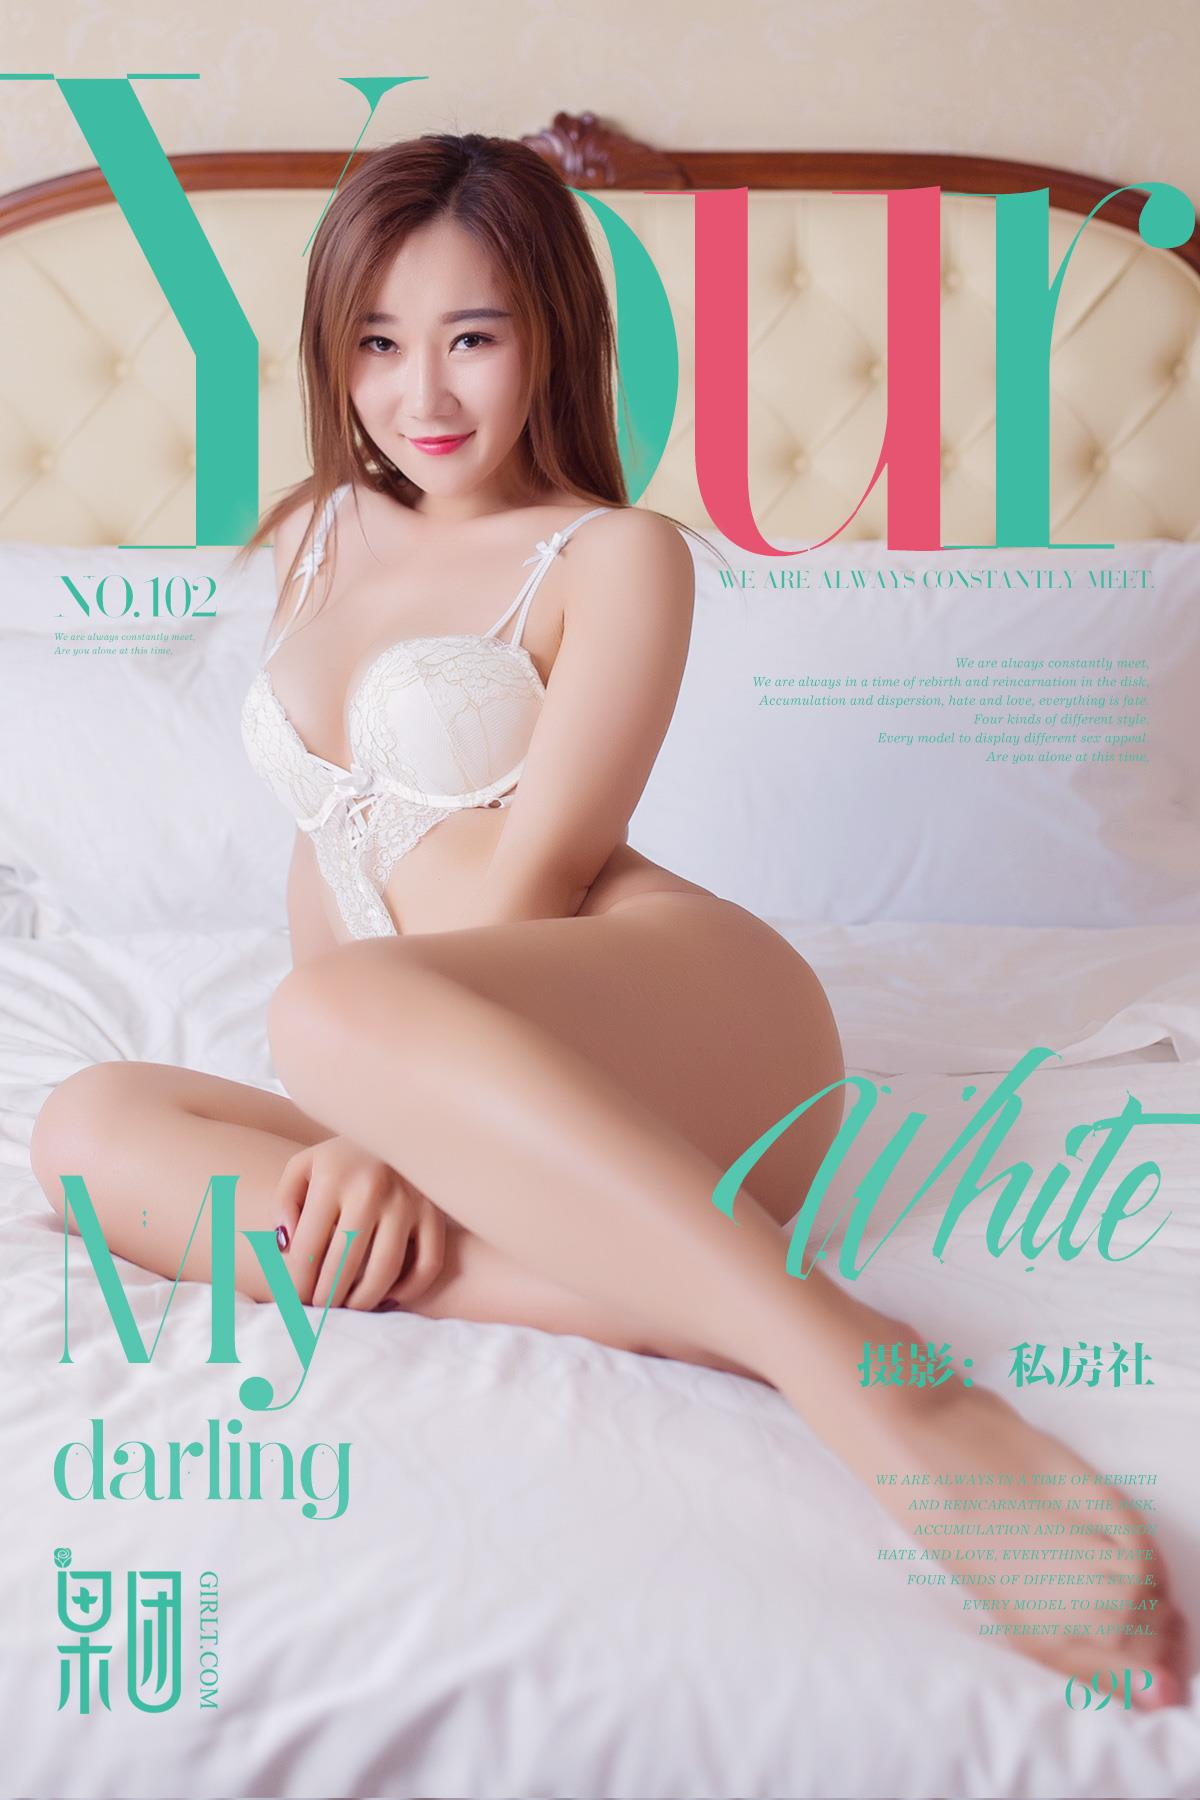 [Girlt果团网]GT20171202NO0102 棉花糖 白色性感蕾丝内衣私房写真集